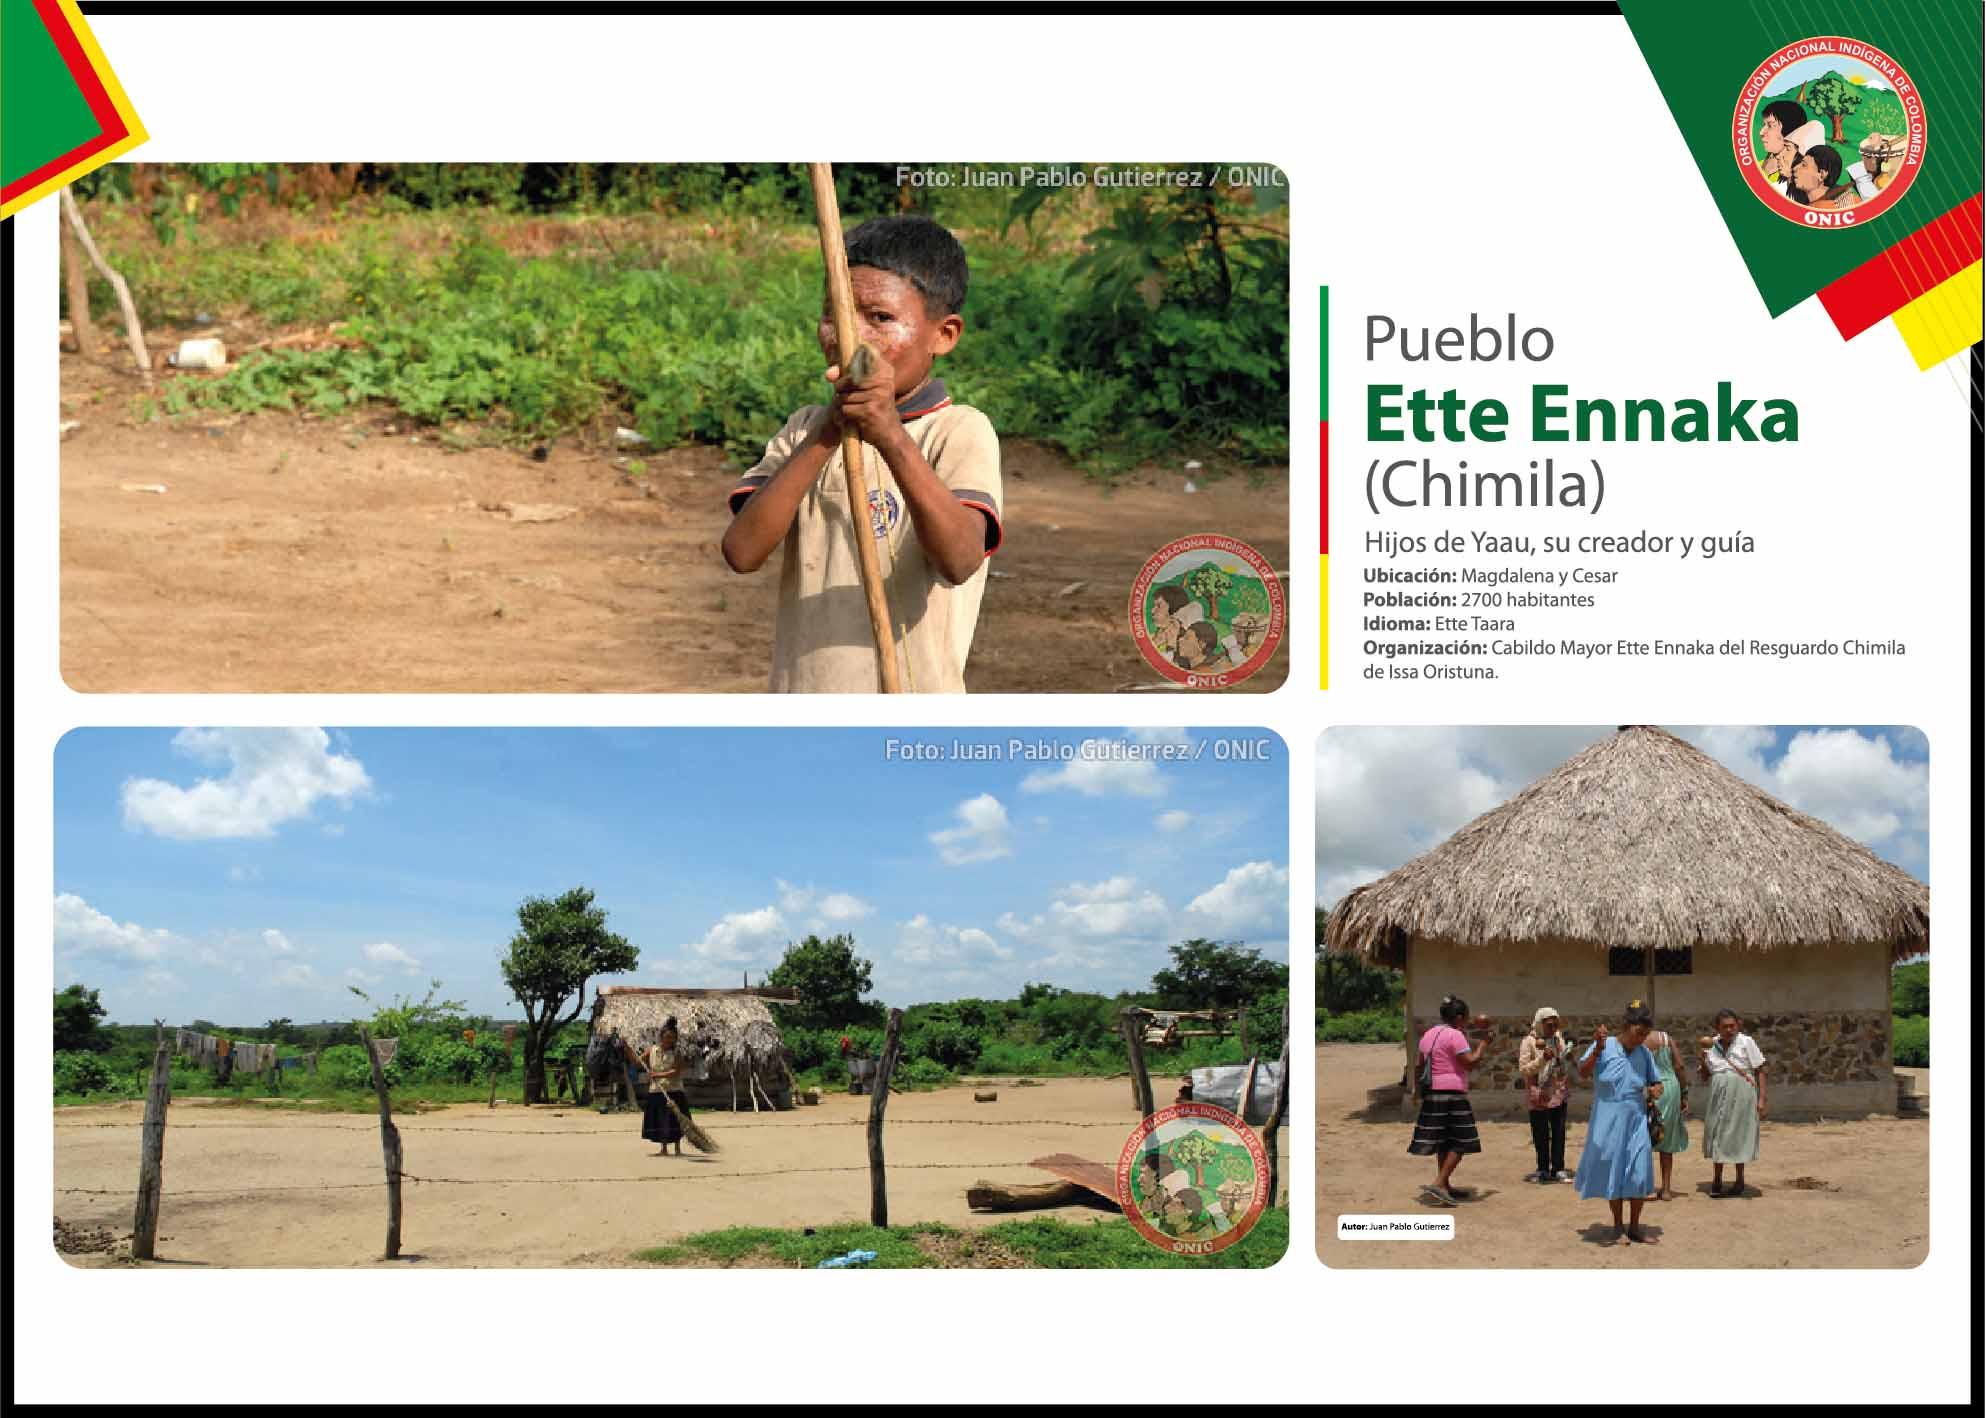 ONIC - Pueblos - photo#33